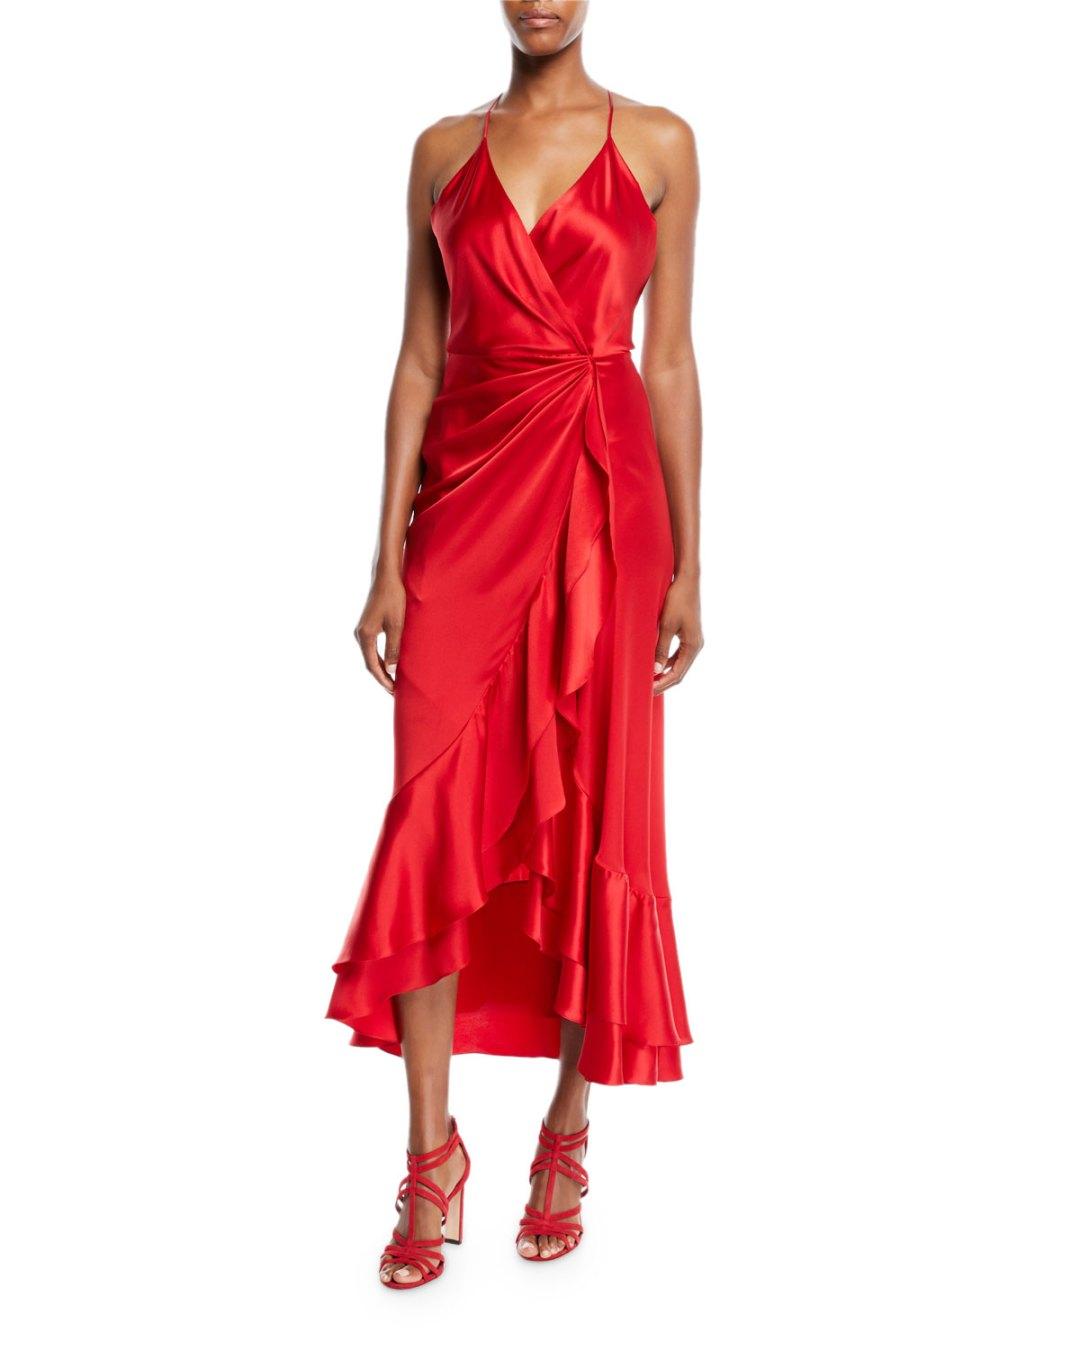 5486617964a JOHANNA ORTIZ – V-Neck Sleeveless Crisscross Asymmetric Drape Silk  Charmeuse Cocktail Dress – Bergdorf Goodman (Neiman Marcus) –  1